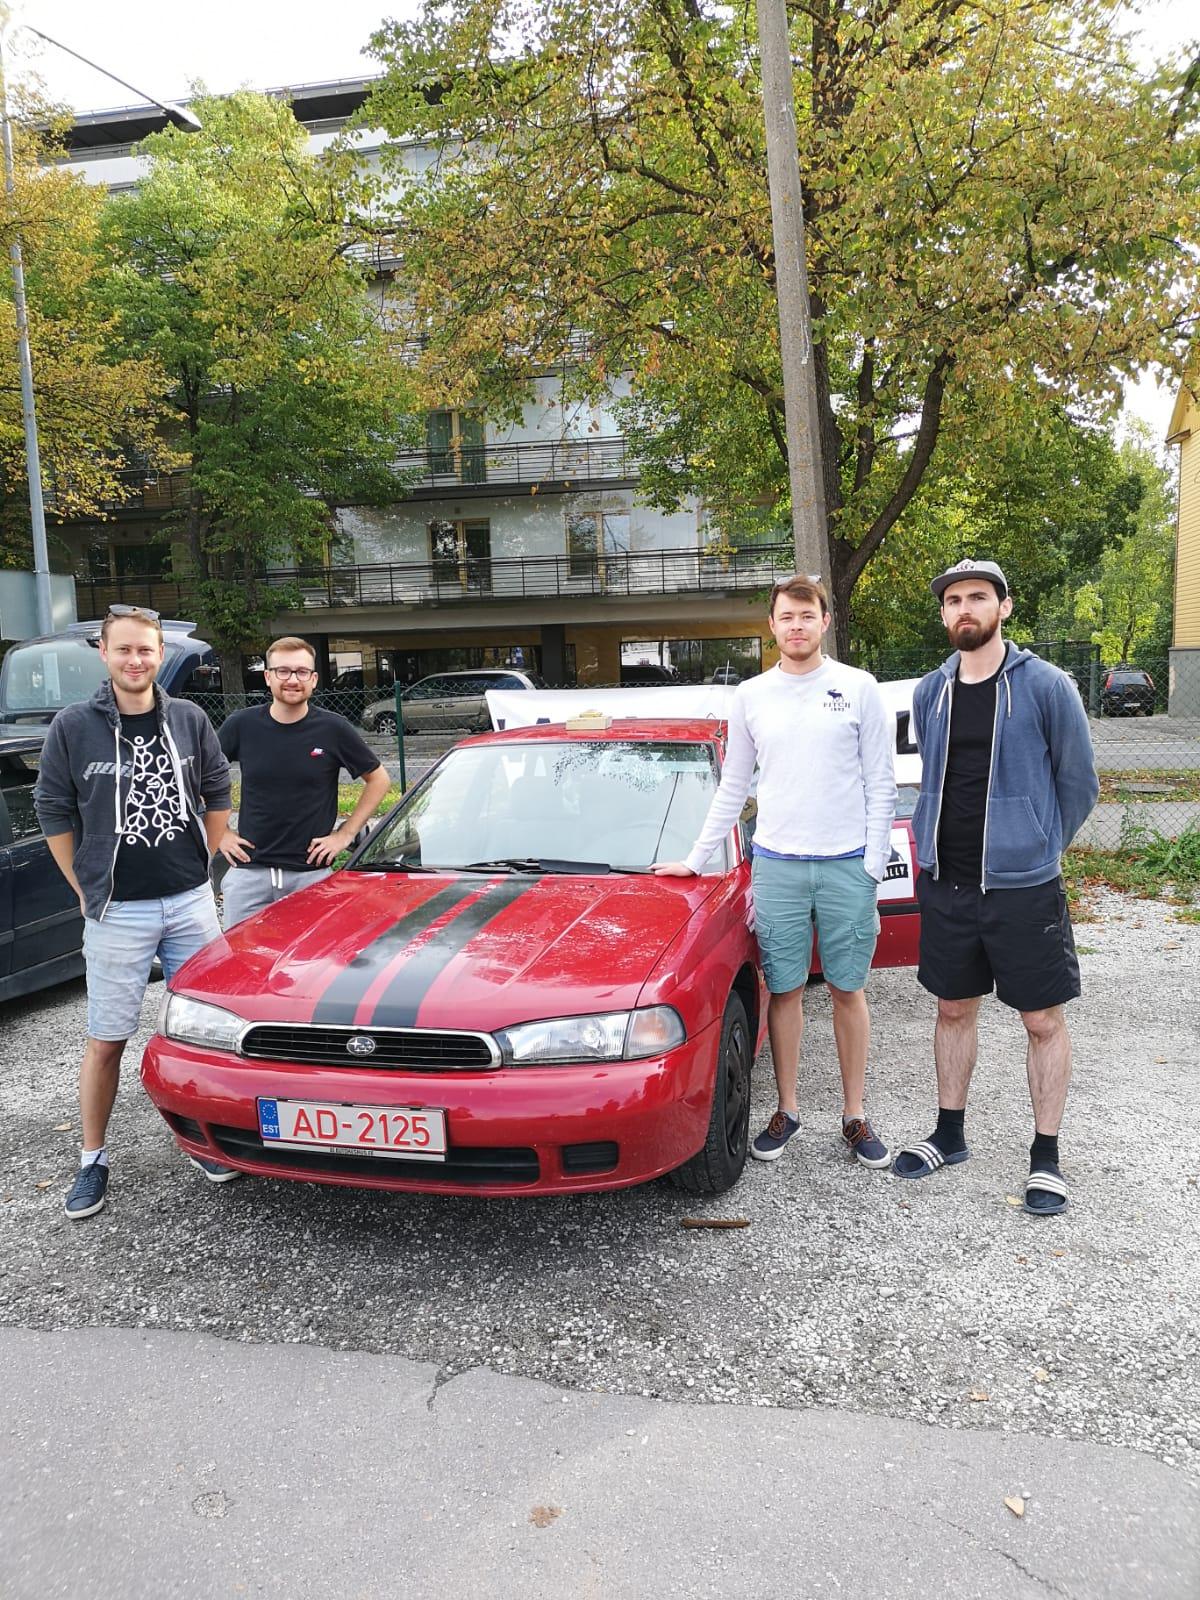 1st - Boohai: Legacy Racing - Rob, Ash, Ash, Cristian